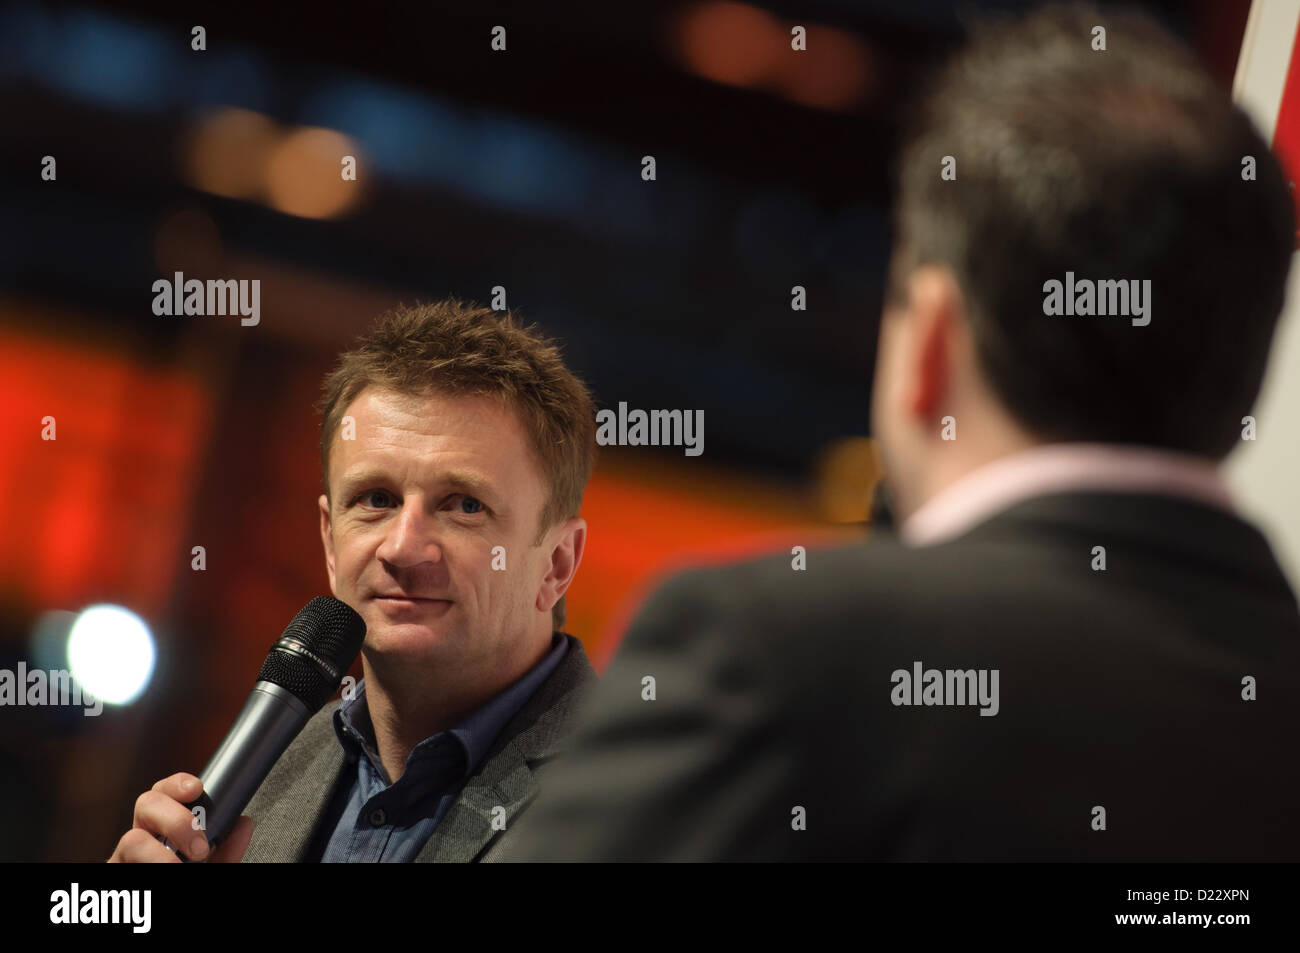 Birmingham NEC, UK, 12. Januar 2013.  Henry Hope-Frost (rechts) interviewt Fahrer Allan McNish (links) auf der Autosport Stockbild